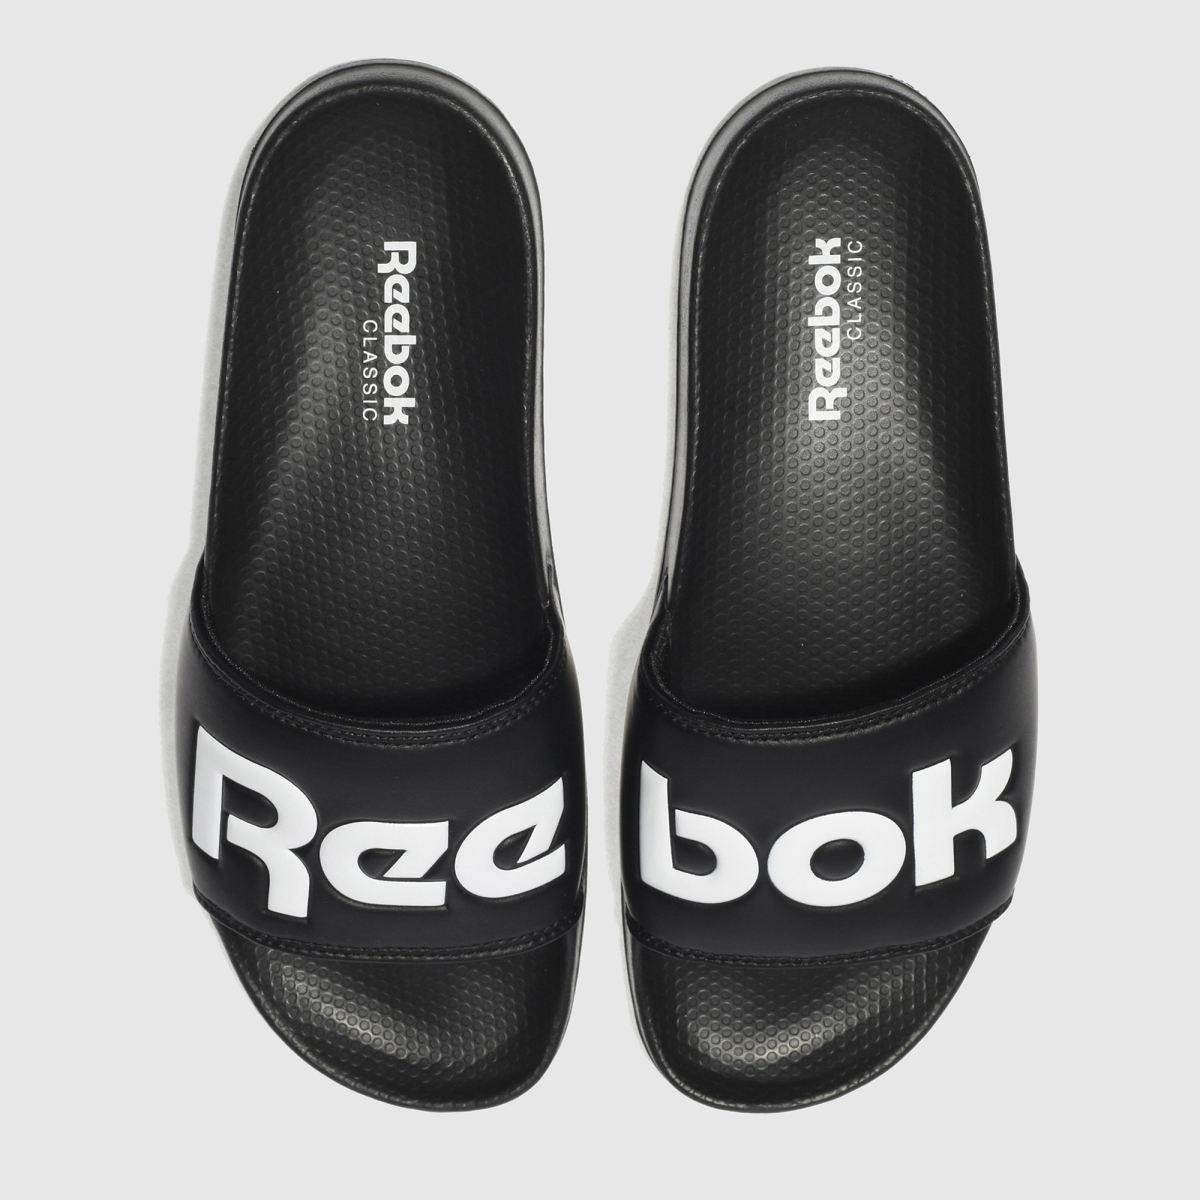 Reebok Black & White Classic Slide Sandals